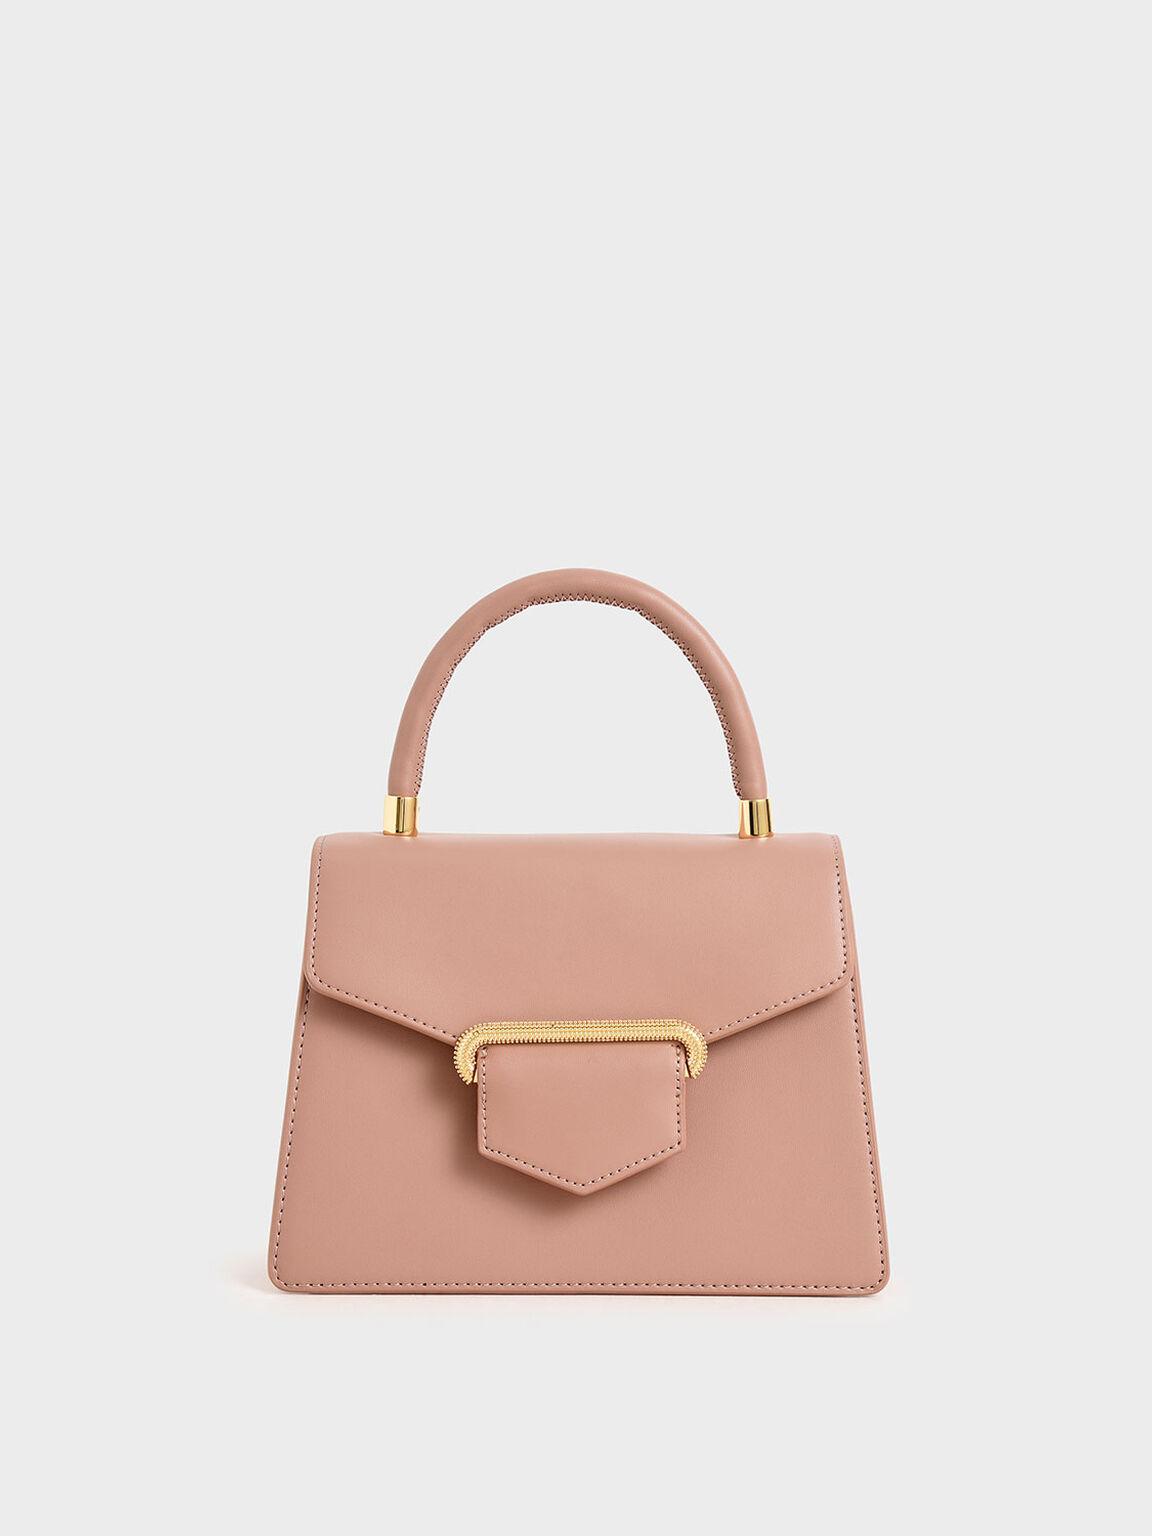 Leather Metallic Accent Handbag, Blush, hi-res